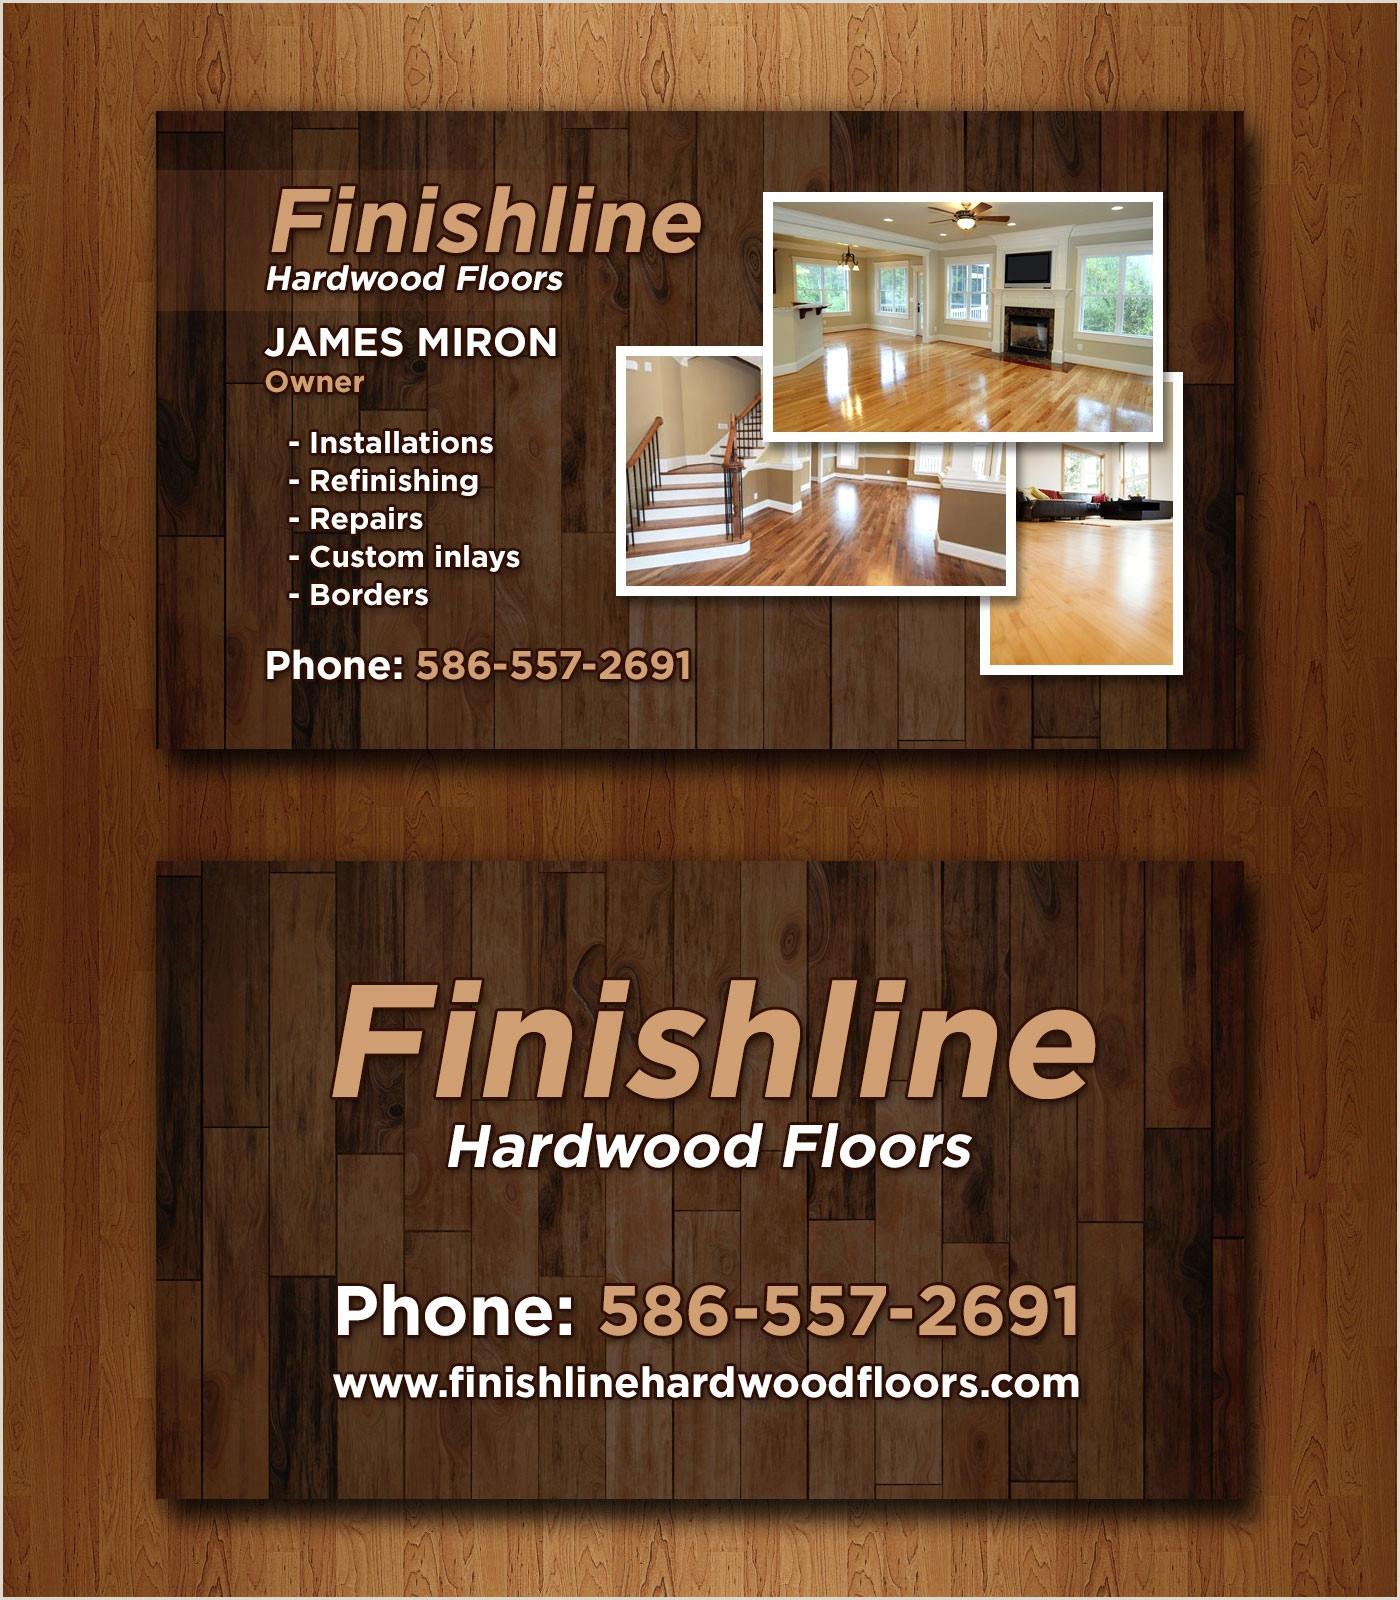 First Class Color Business Cards 14 Popular Hardwood Flooring Business Card Template